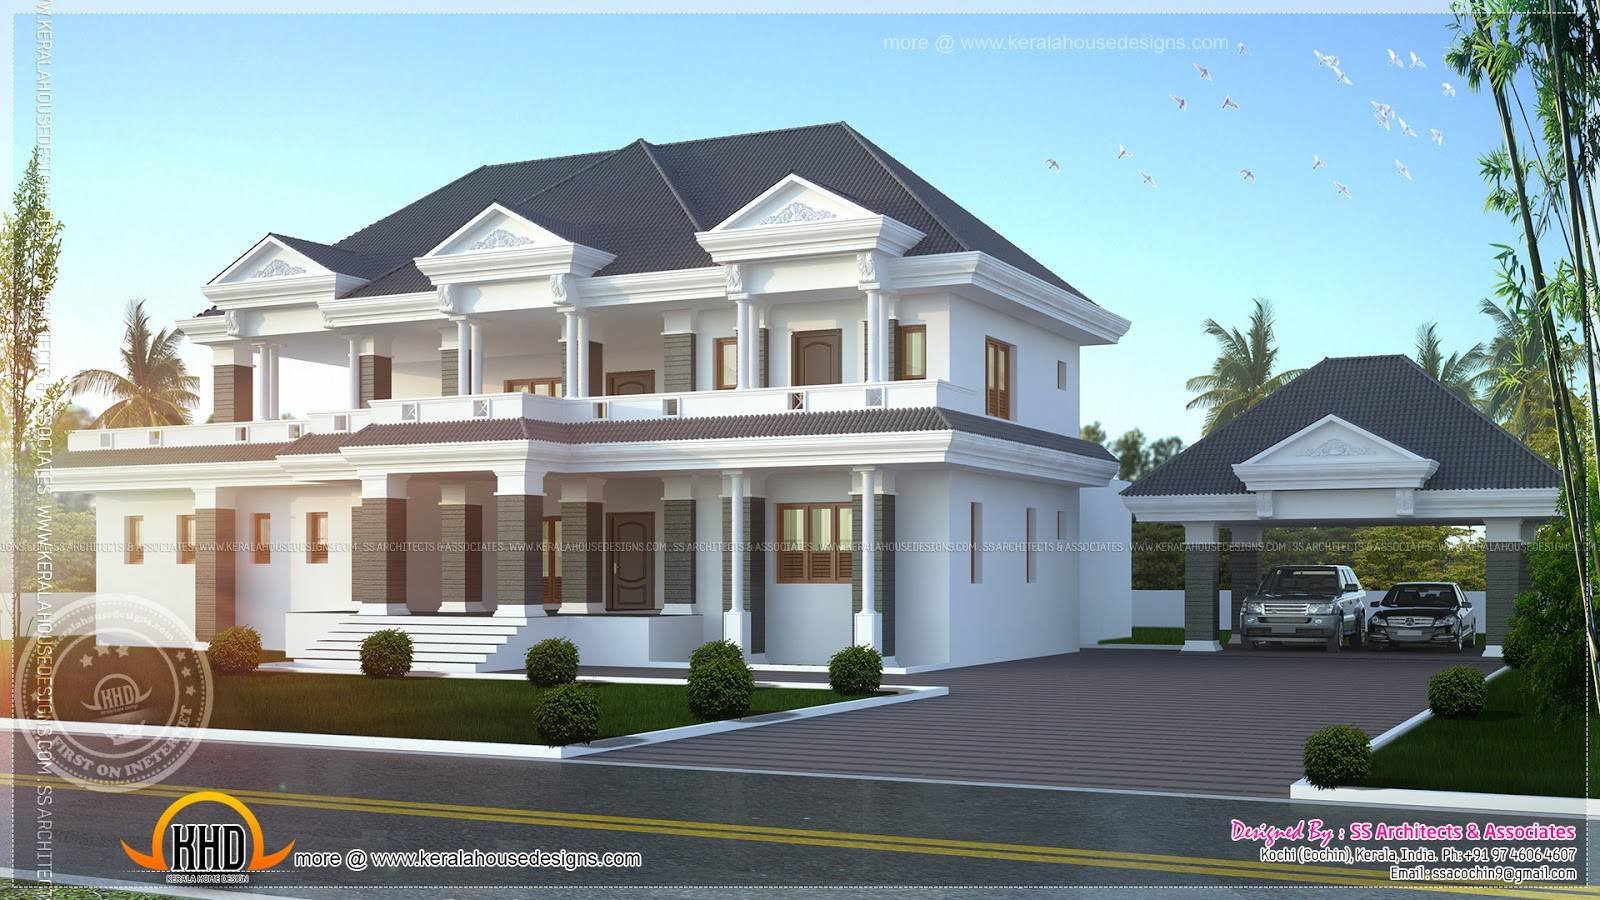 Sensational Modern Super Luxury Home Design Kerala Floor Plans House Plans Largest Home Design Picture Inspirations Pitcheantrous